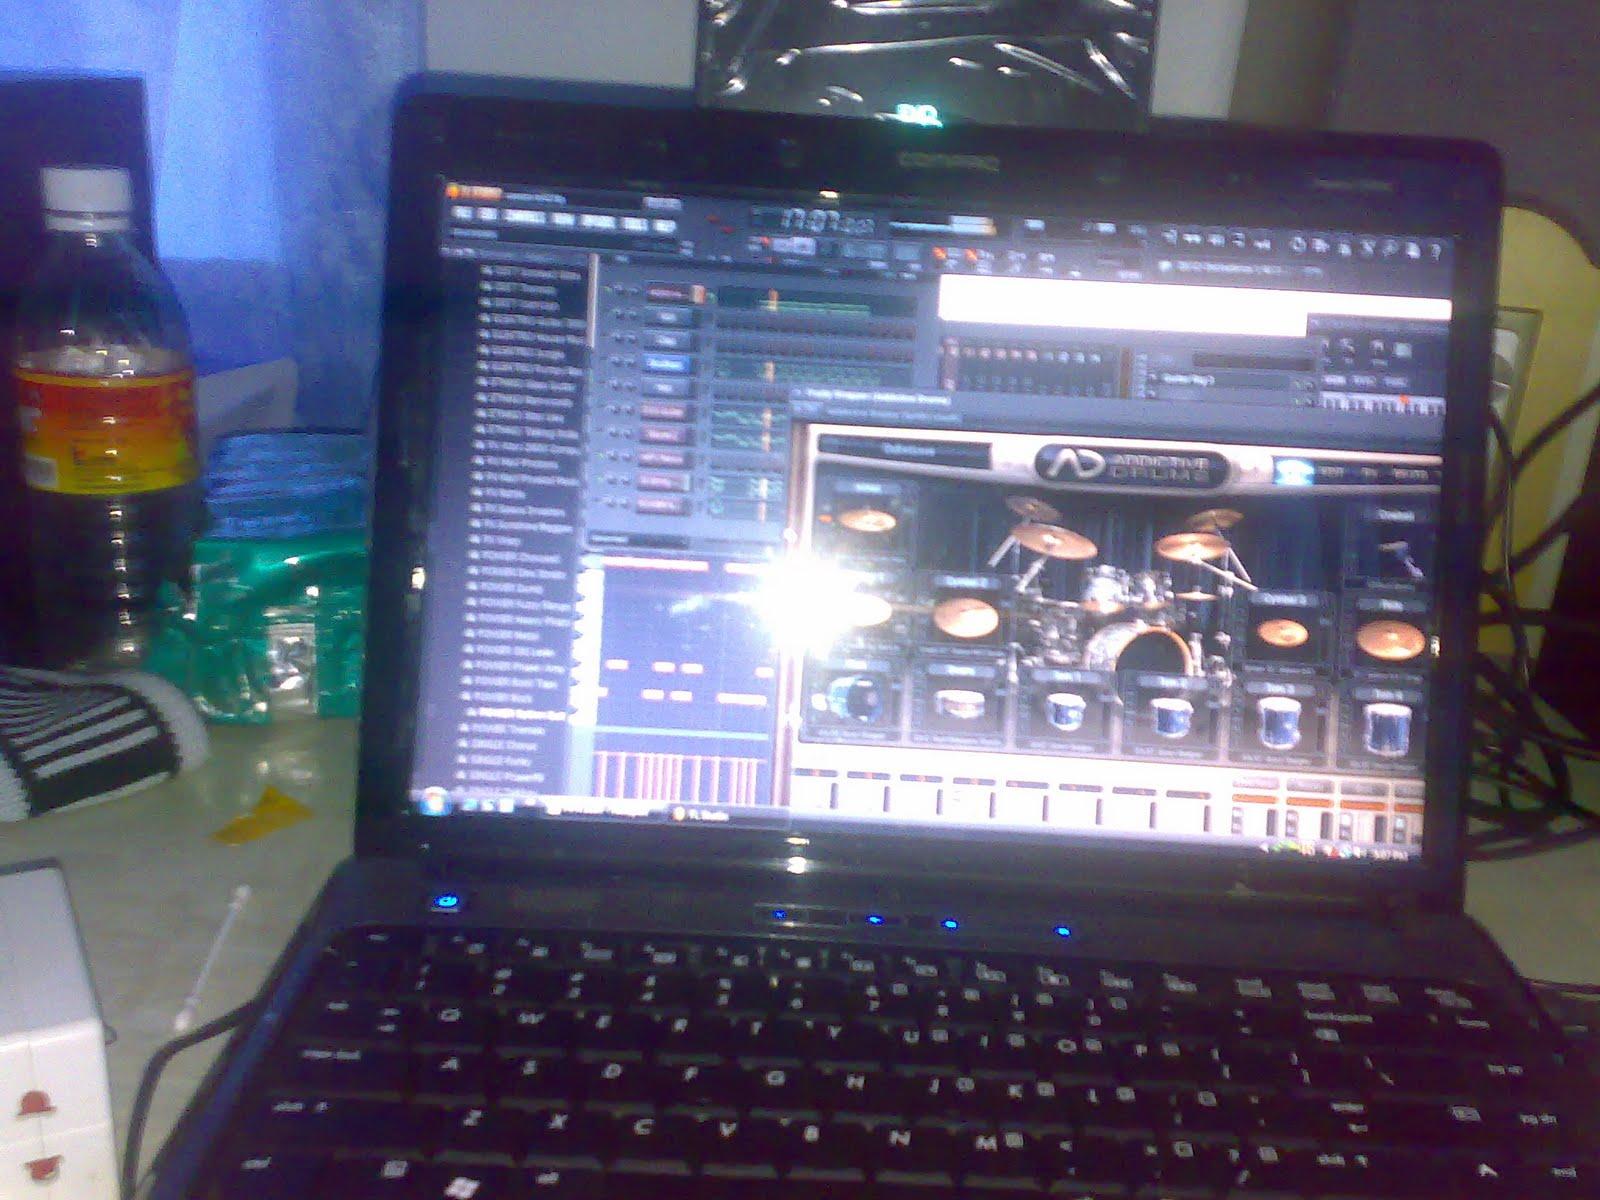 Whiplash Claims Average Payout >> fl studio fruity loops malaysia belajar muzik addictive drums bagaimana belajar fruity loops ...